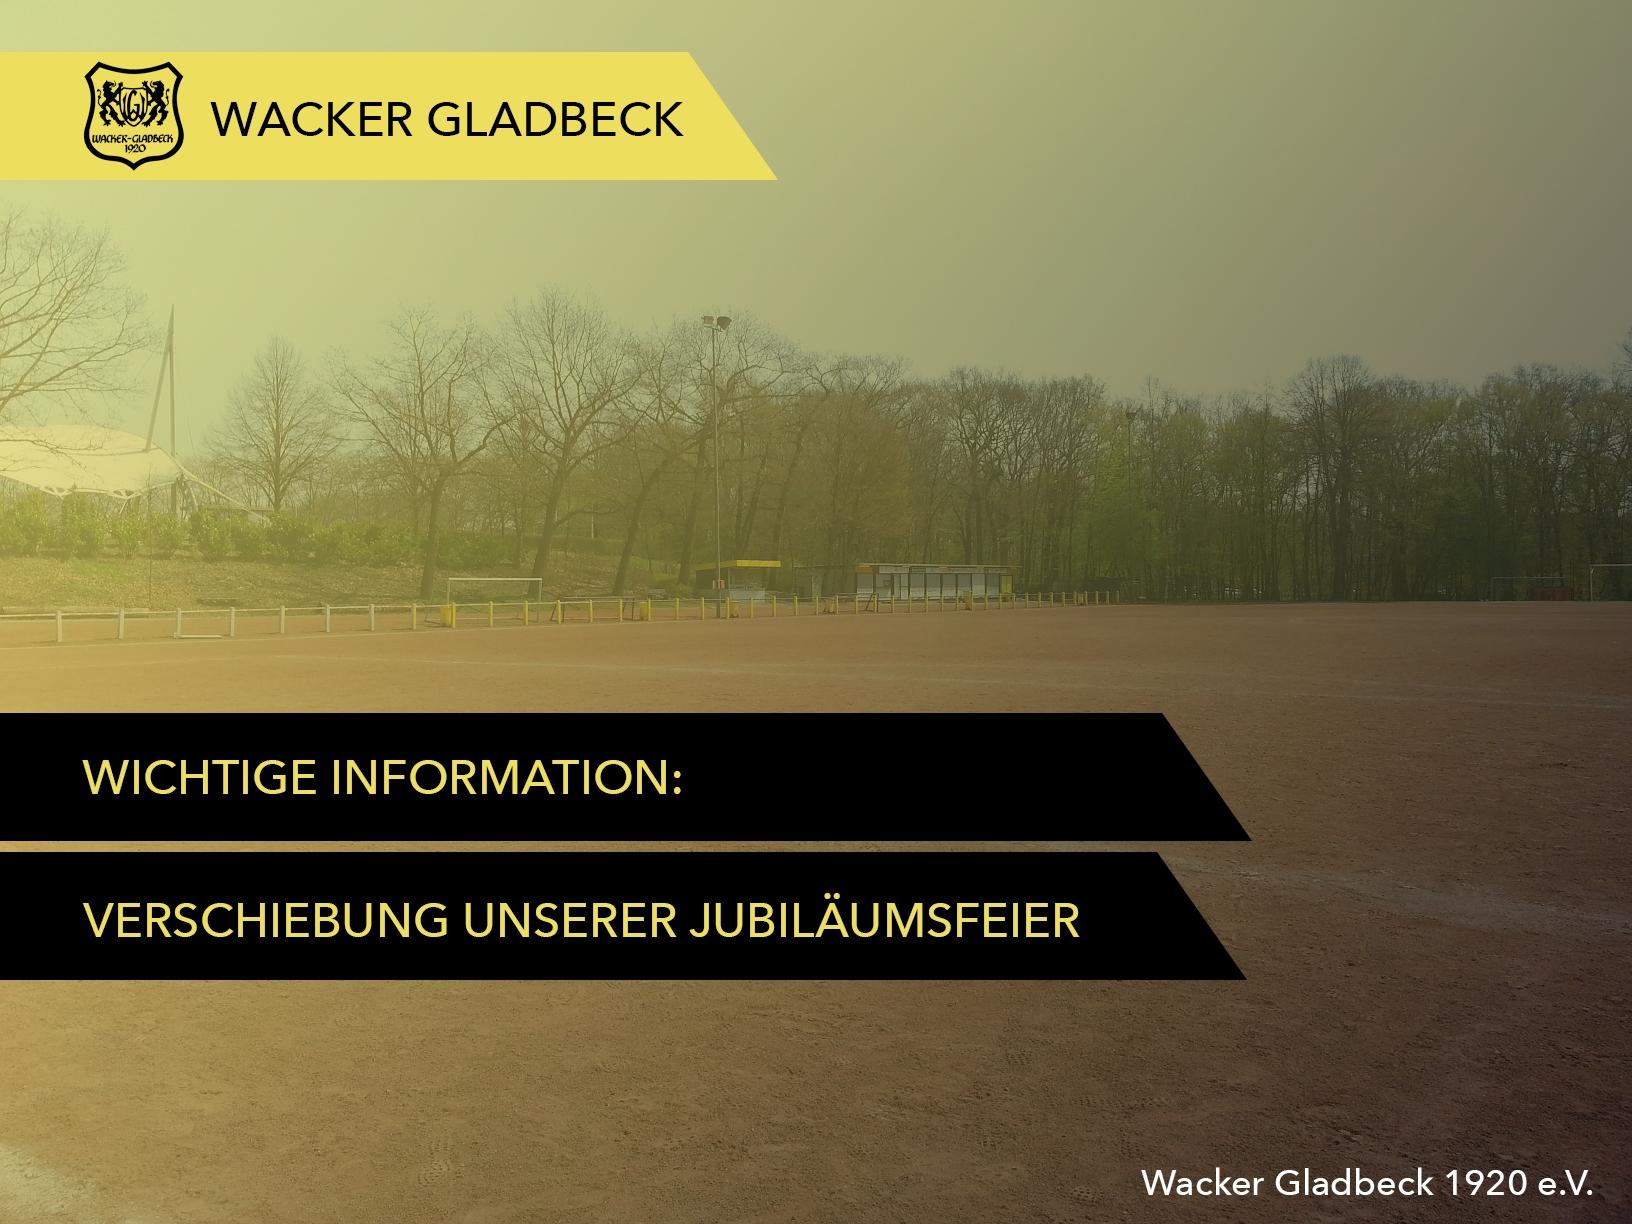 Wacker Gladbeck - Verschiebung der Jubiläumsfeier